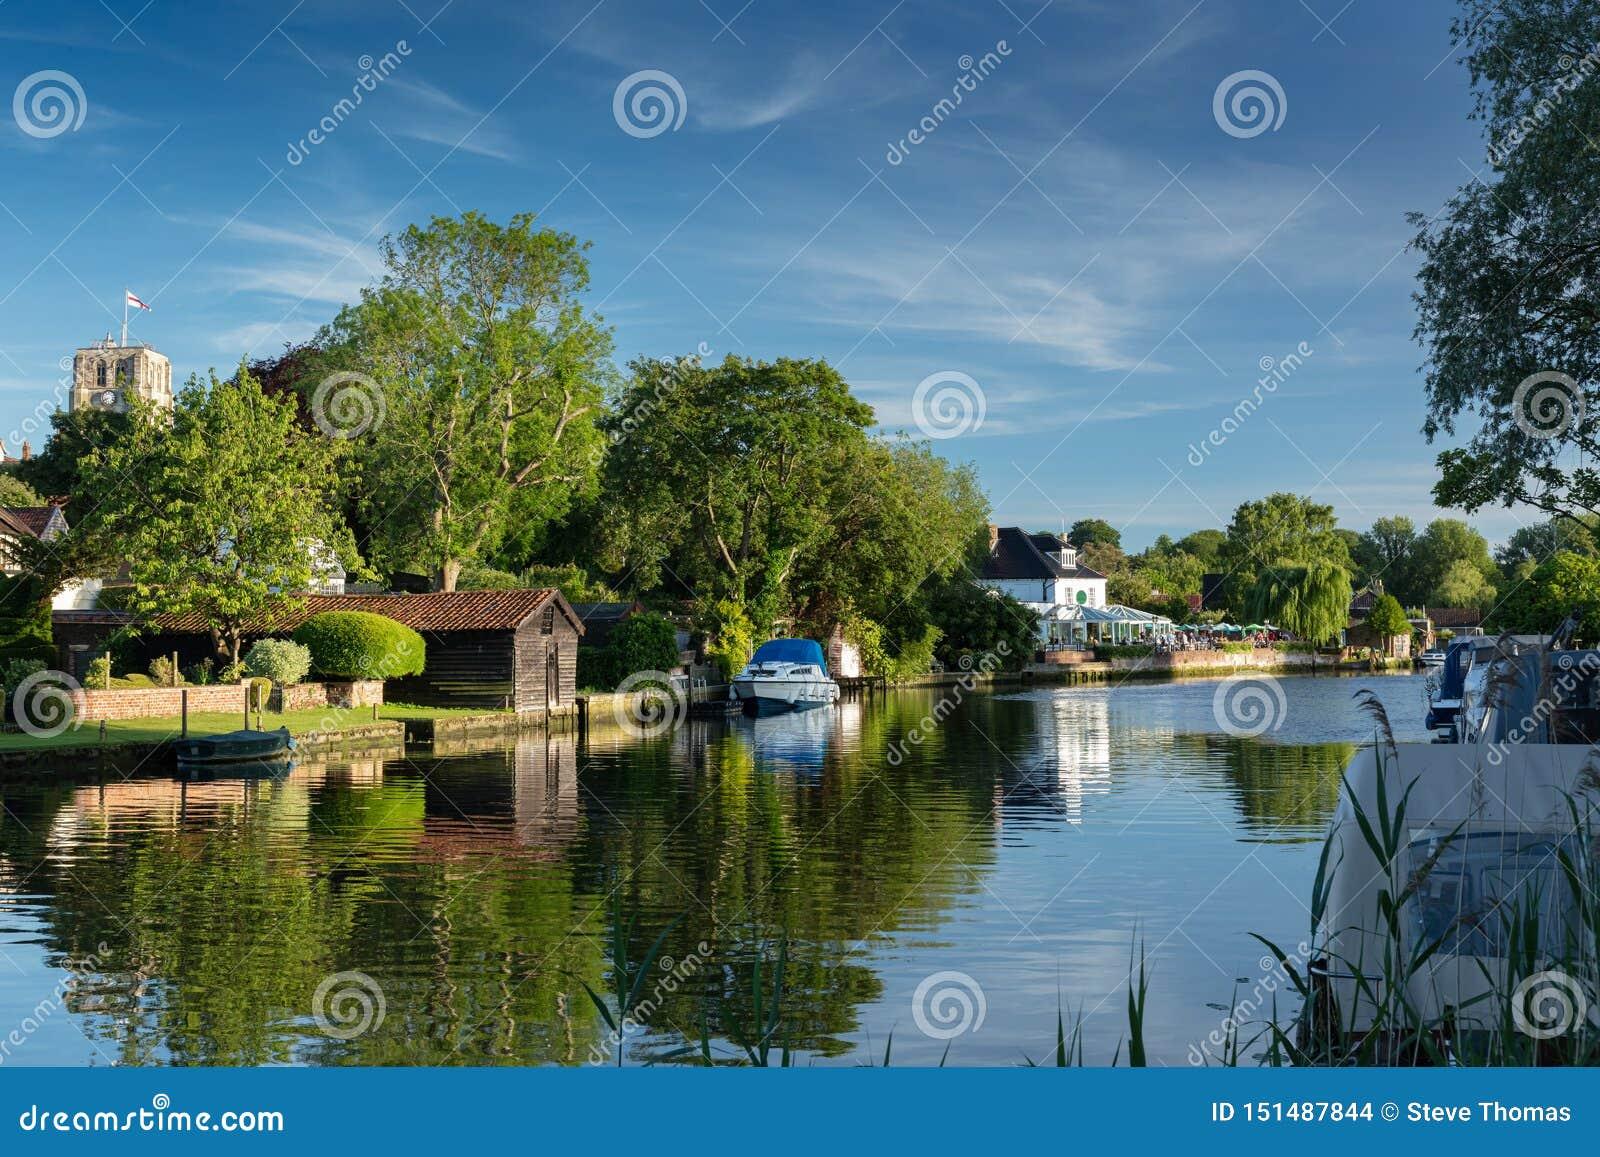 Flod Waveney, Beccles, UK, Juni 2019